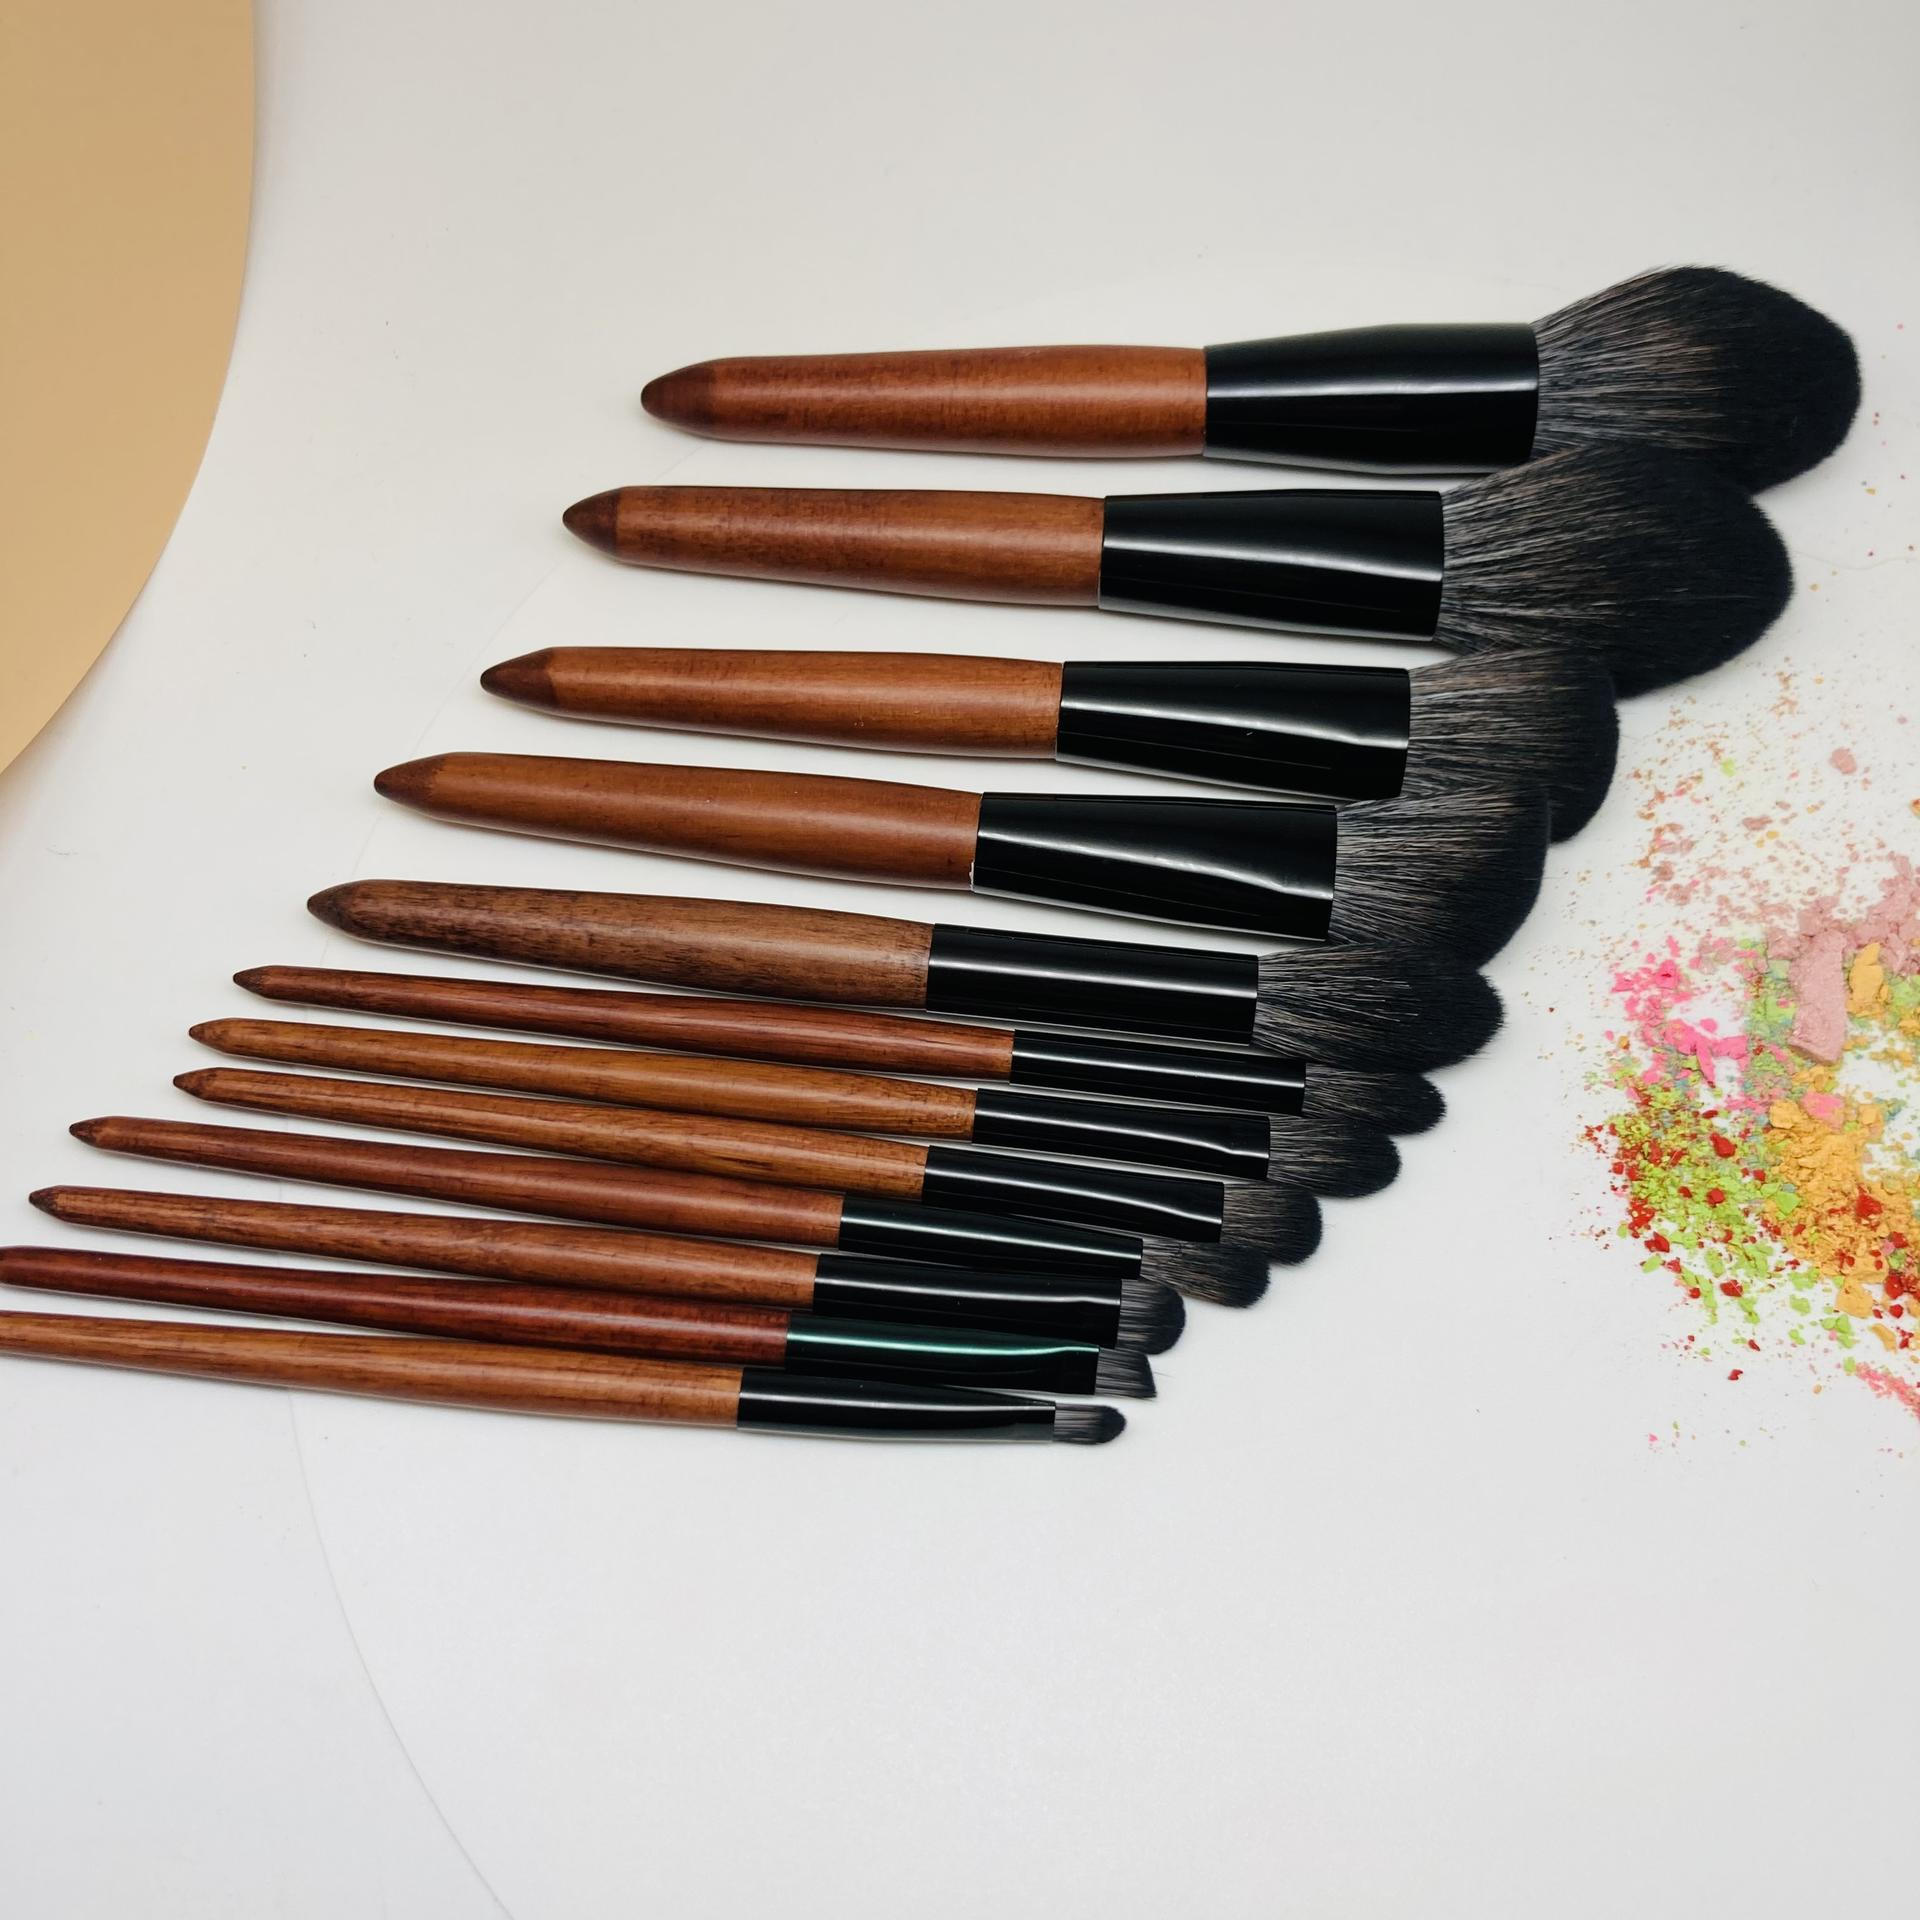 Travel make up brush bag packging vegan custom logo portable make up brushes 12 pcs